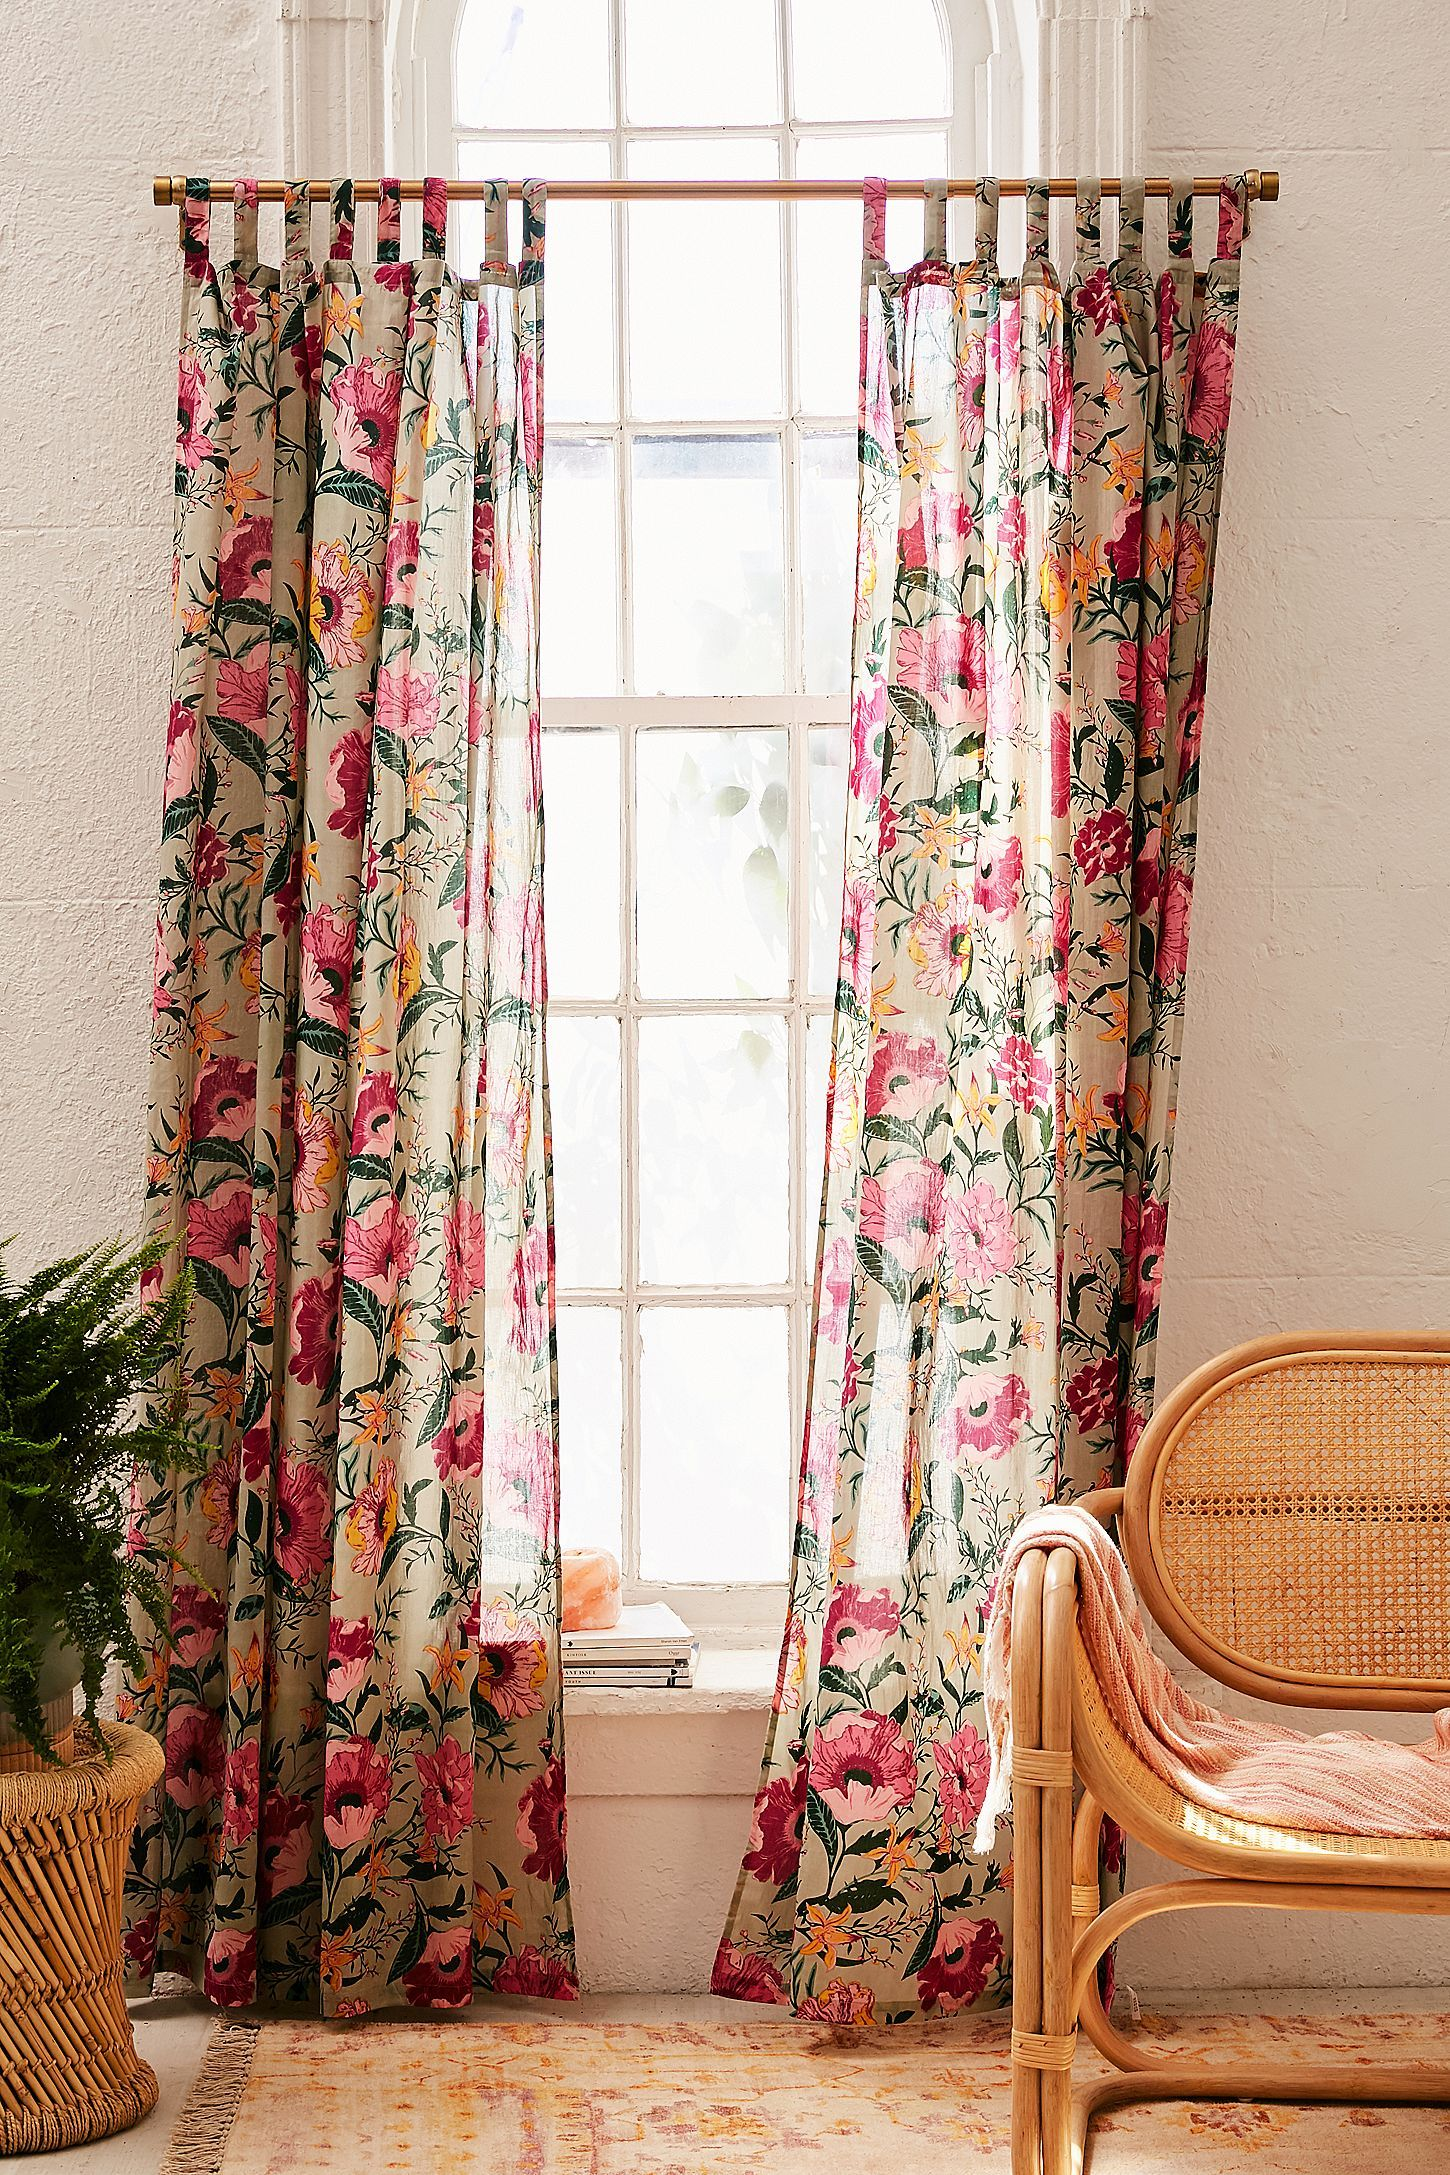 Poppy Window Curtain House Stuff Pinterest Window curtains